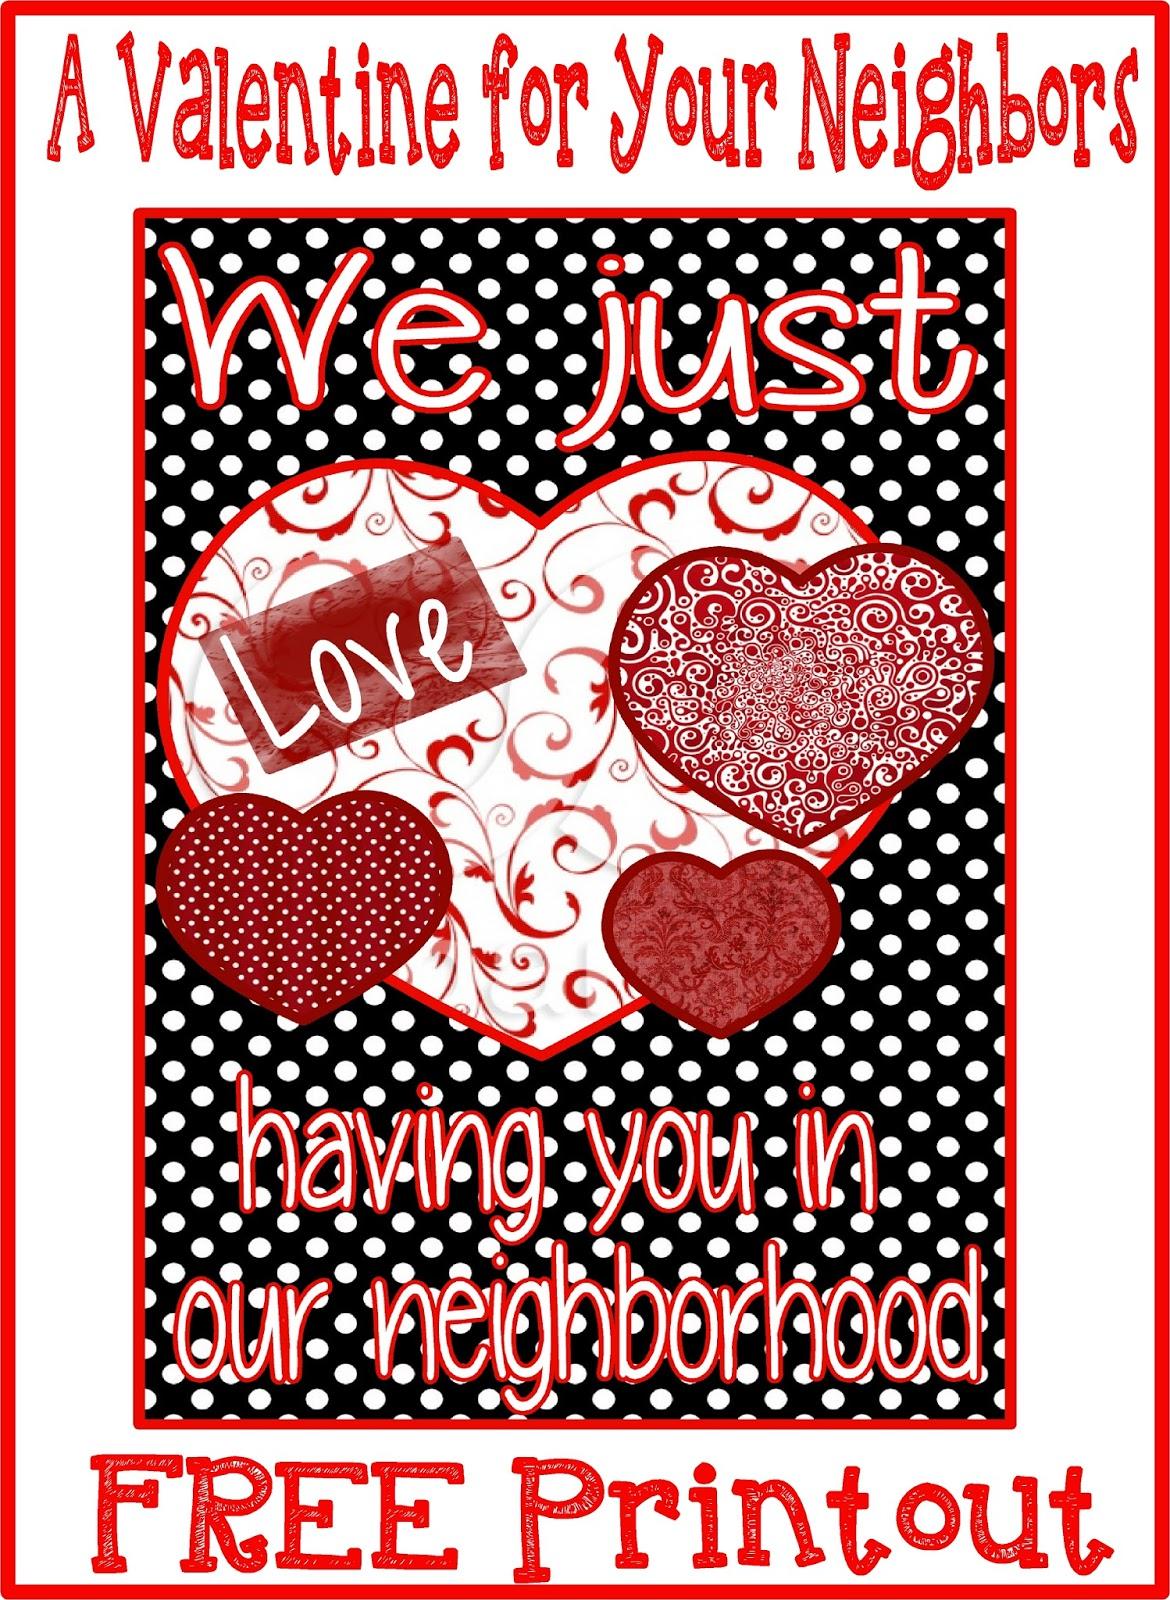 http://hollyshome-hollyshome.blogspot.com/2014/02/a-valentine-for-your-neighbors-free.html